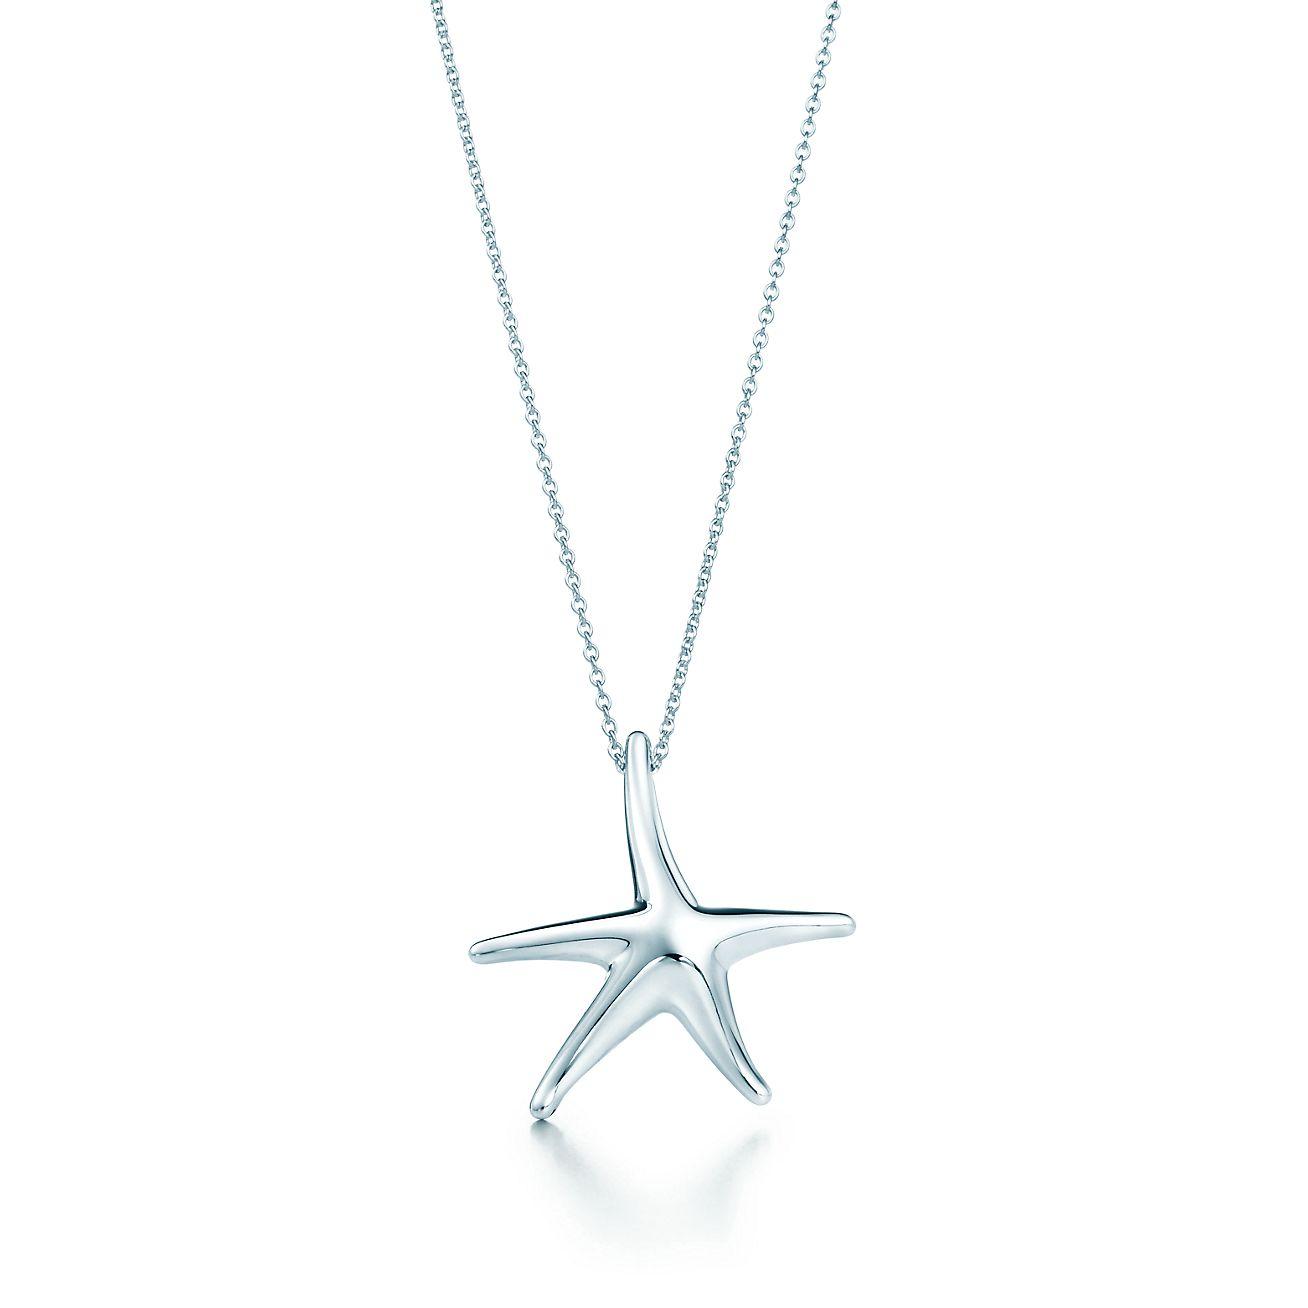 Elsa peretti starfish pendant in sterling silver 28 mm elsa perettistarfish pendant audiocablefo Light gallery